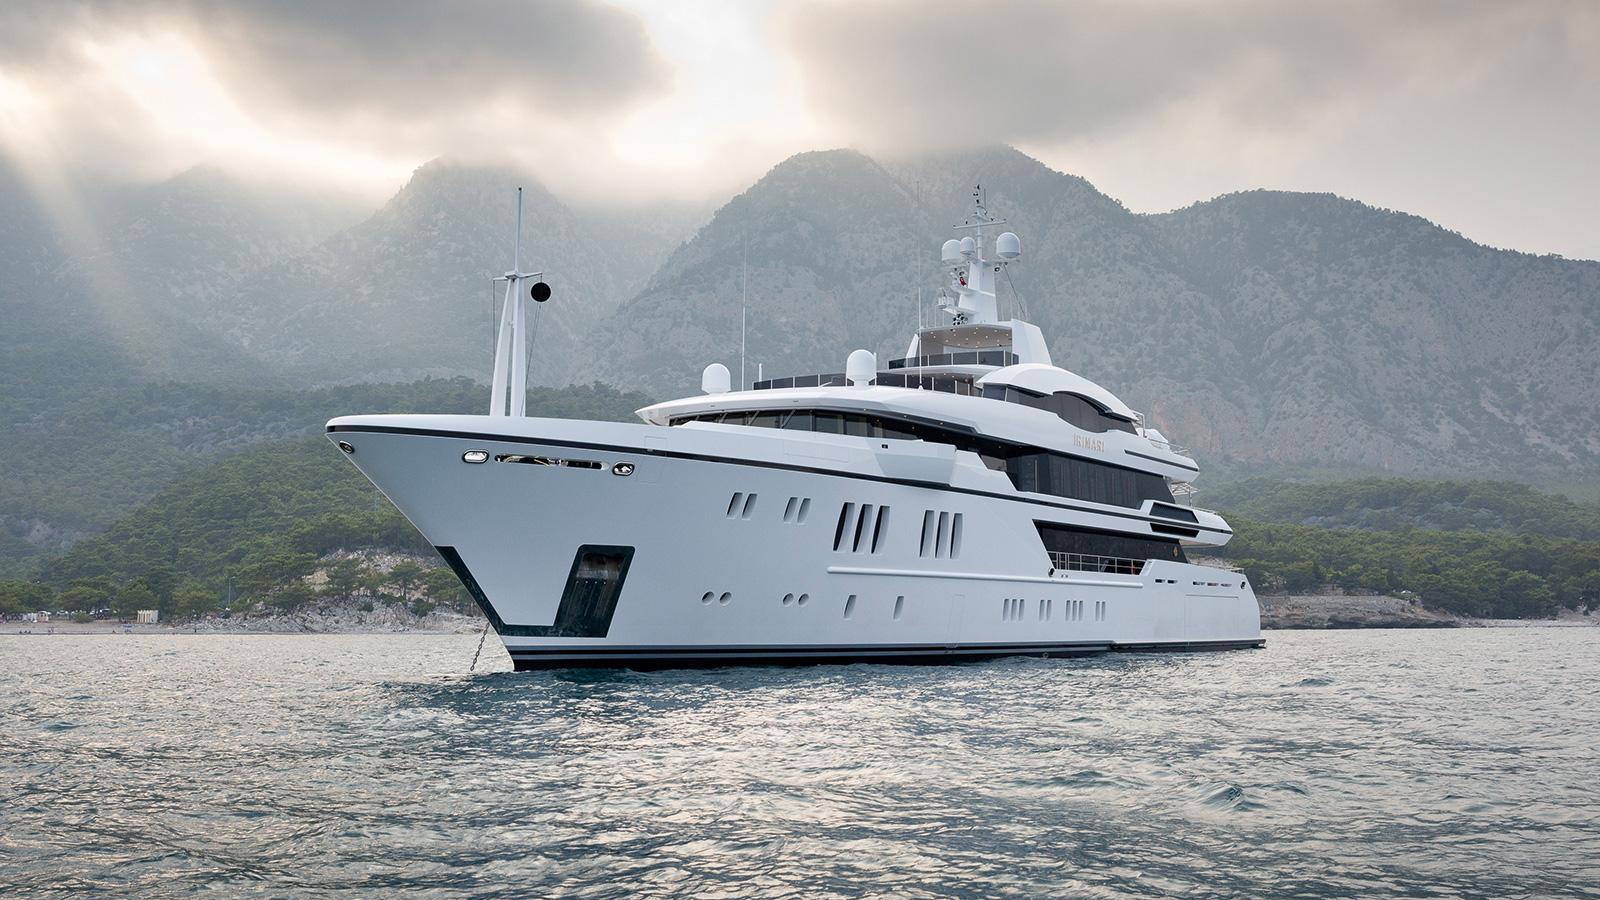 irimari-motor-yacht-sunrise-2015-63m-side-bow